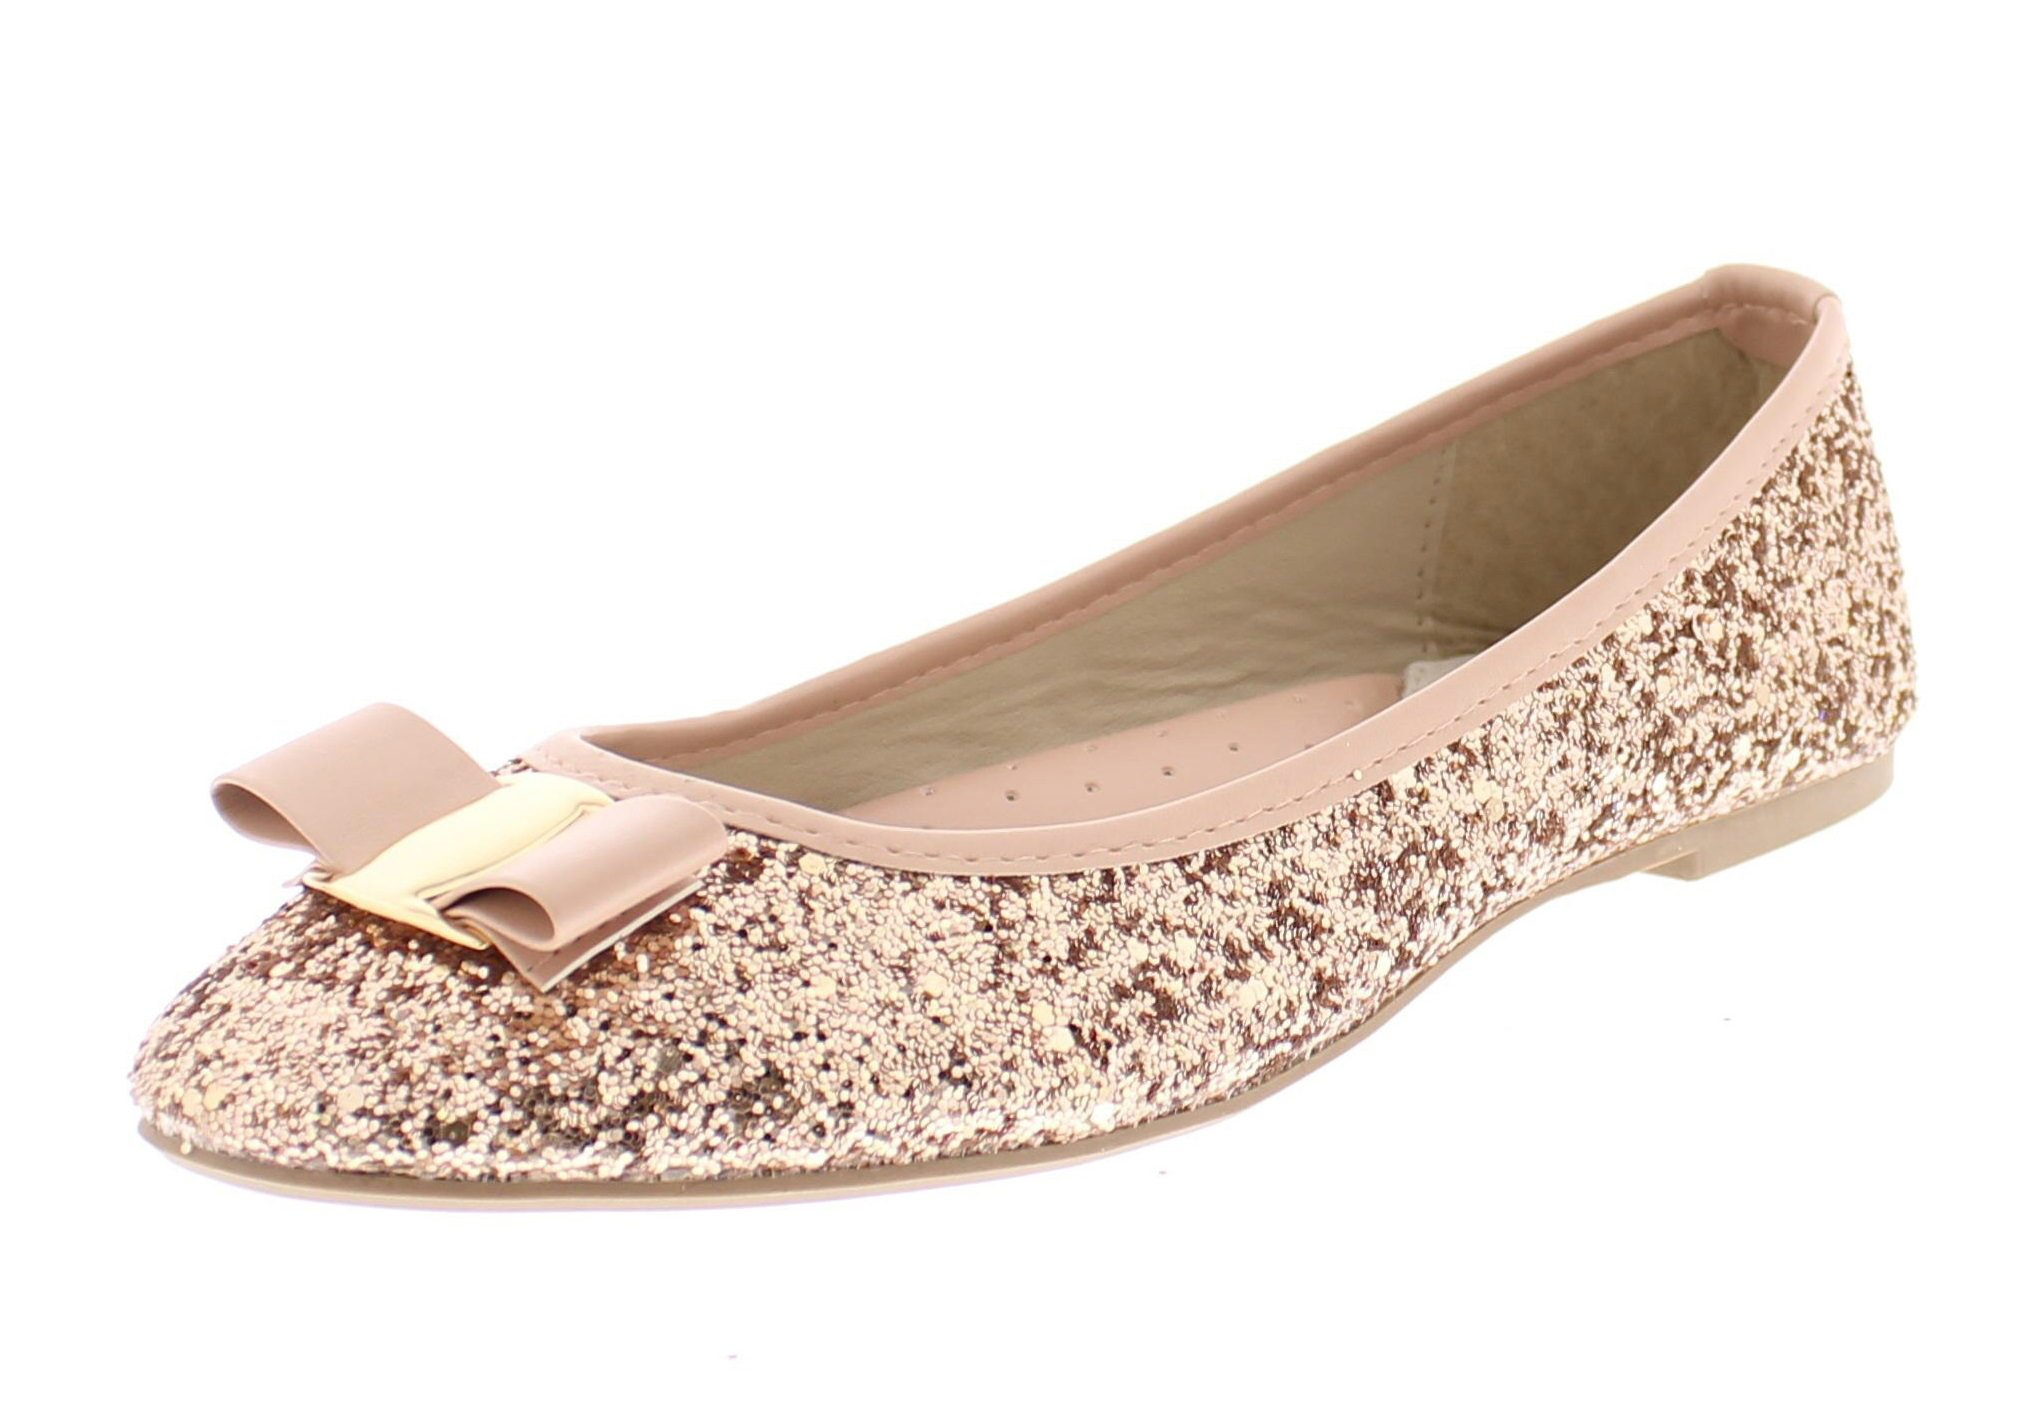 Gold Toe Women's Tempest Metallic Sequin Sparkle Ballet Flat Slipon Dress Pump Bow Ballerina Skimmer Shoe Pink 8 US